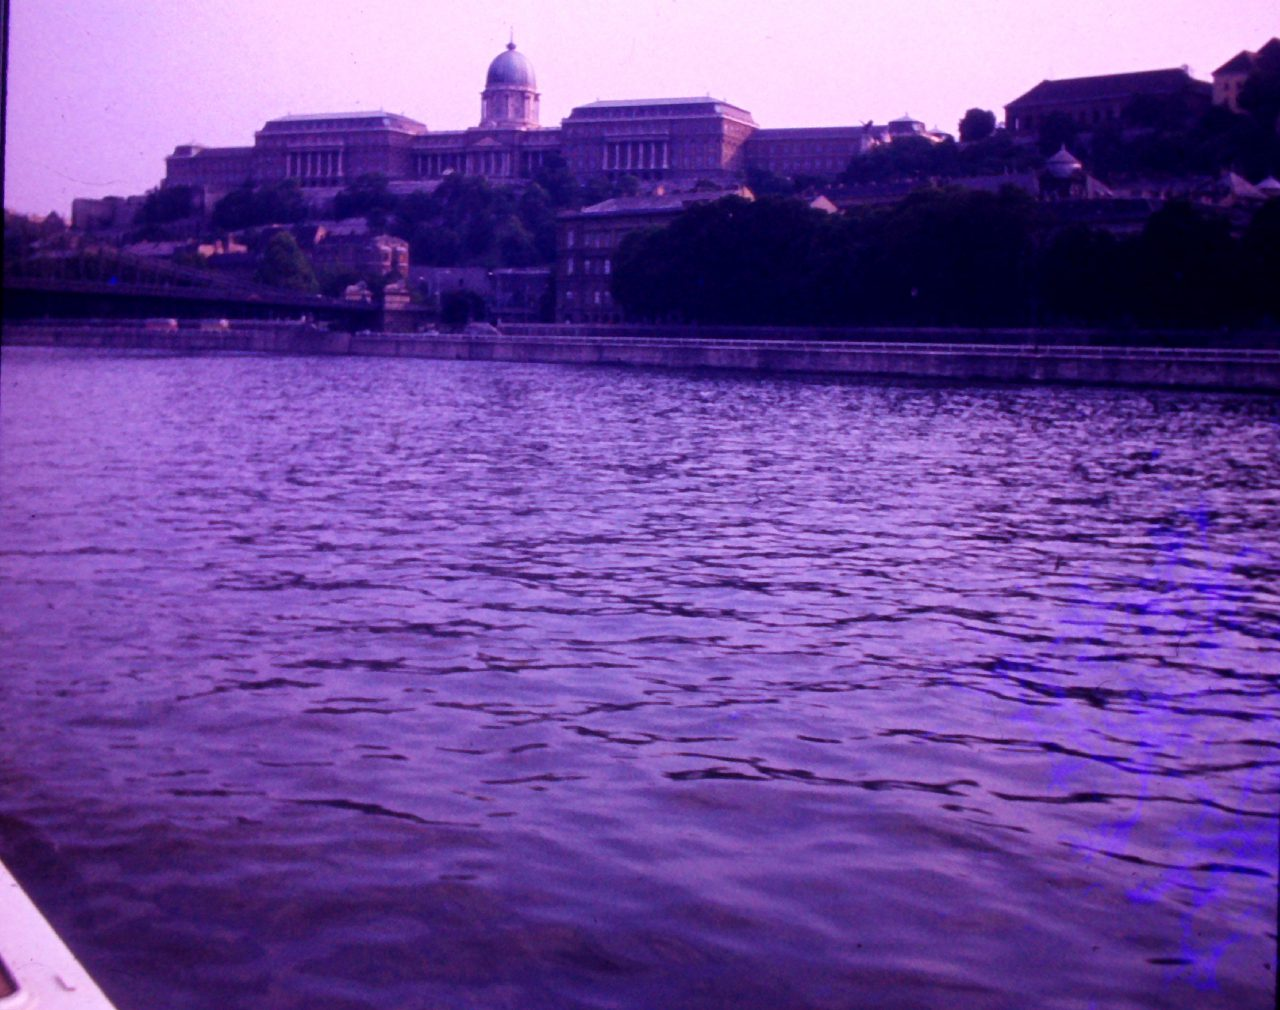 Budapest Donauschifffahrt, aus Familienbesitz, kasaan media, 2019